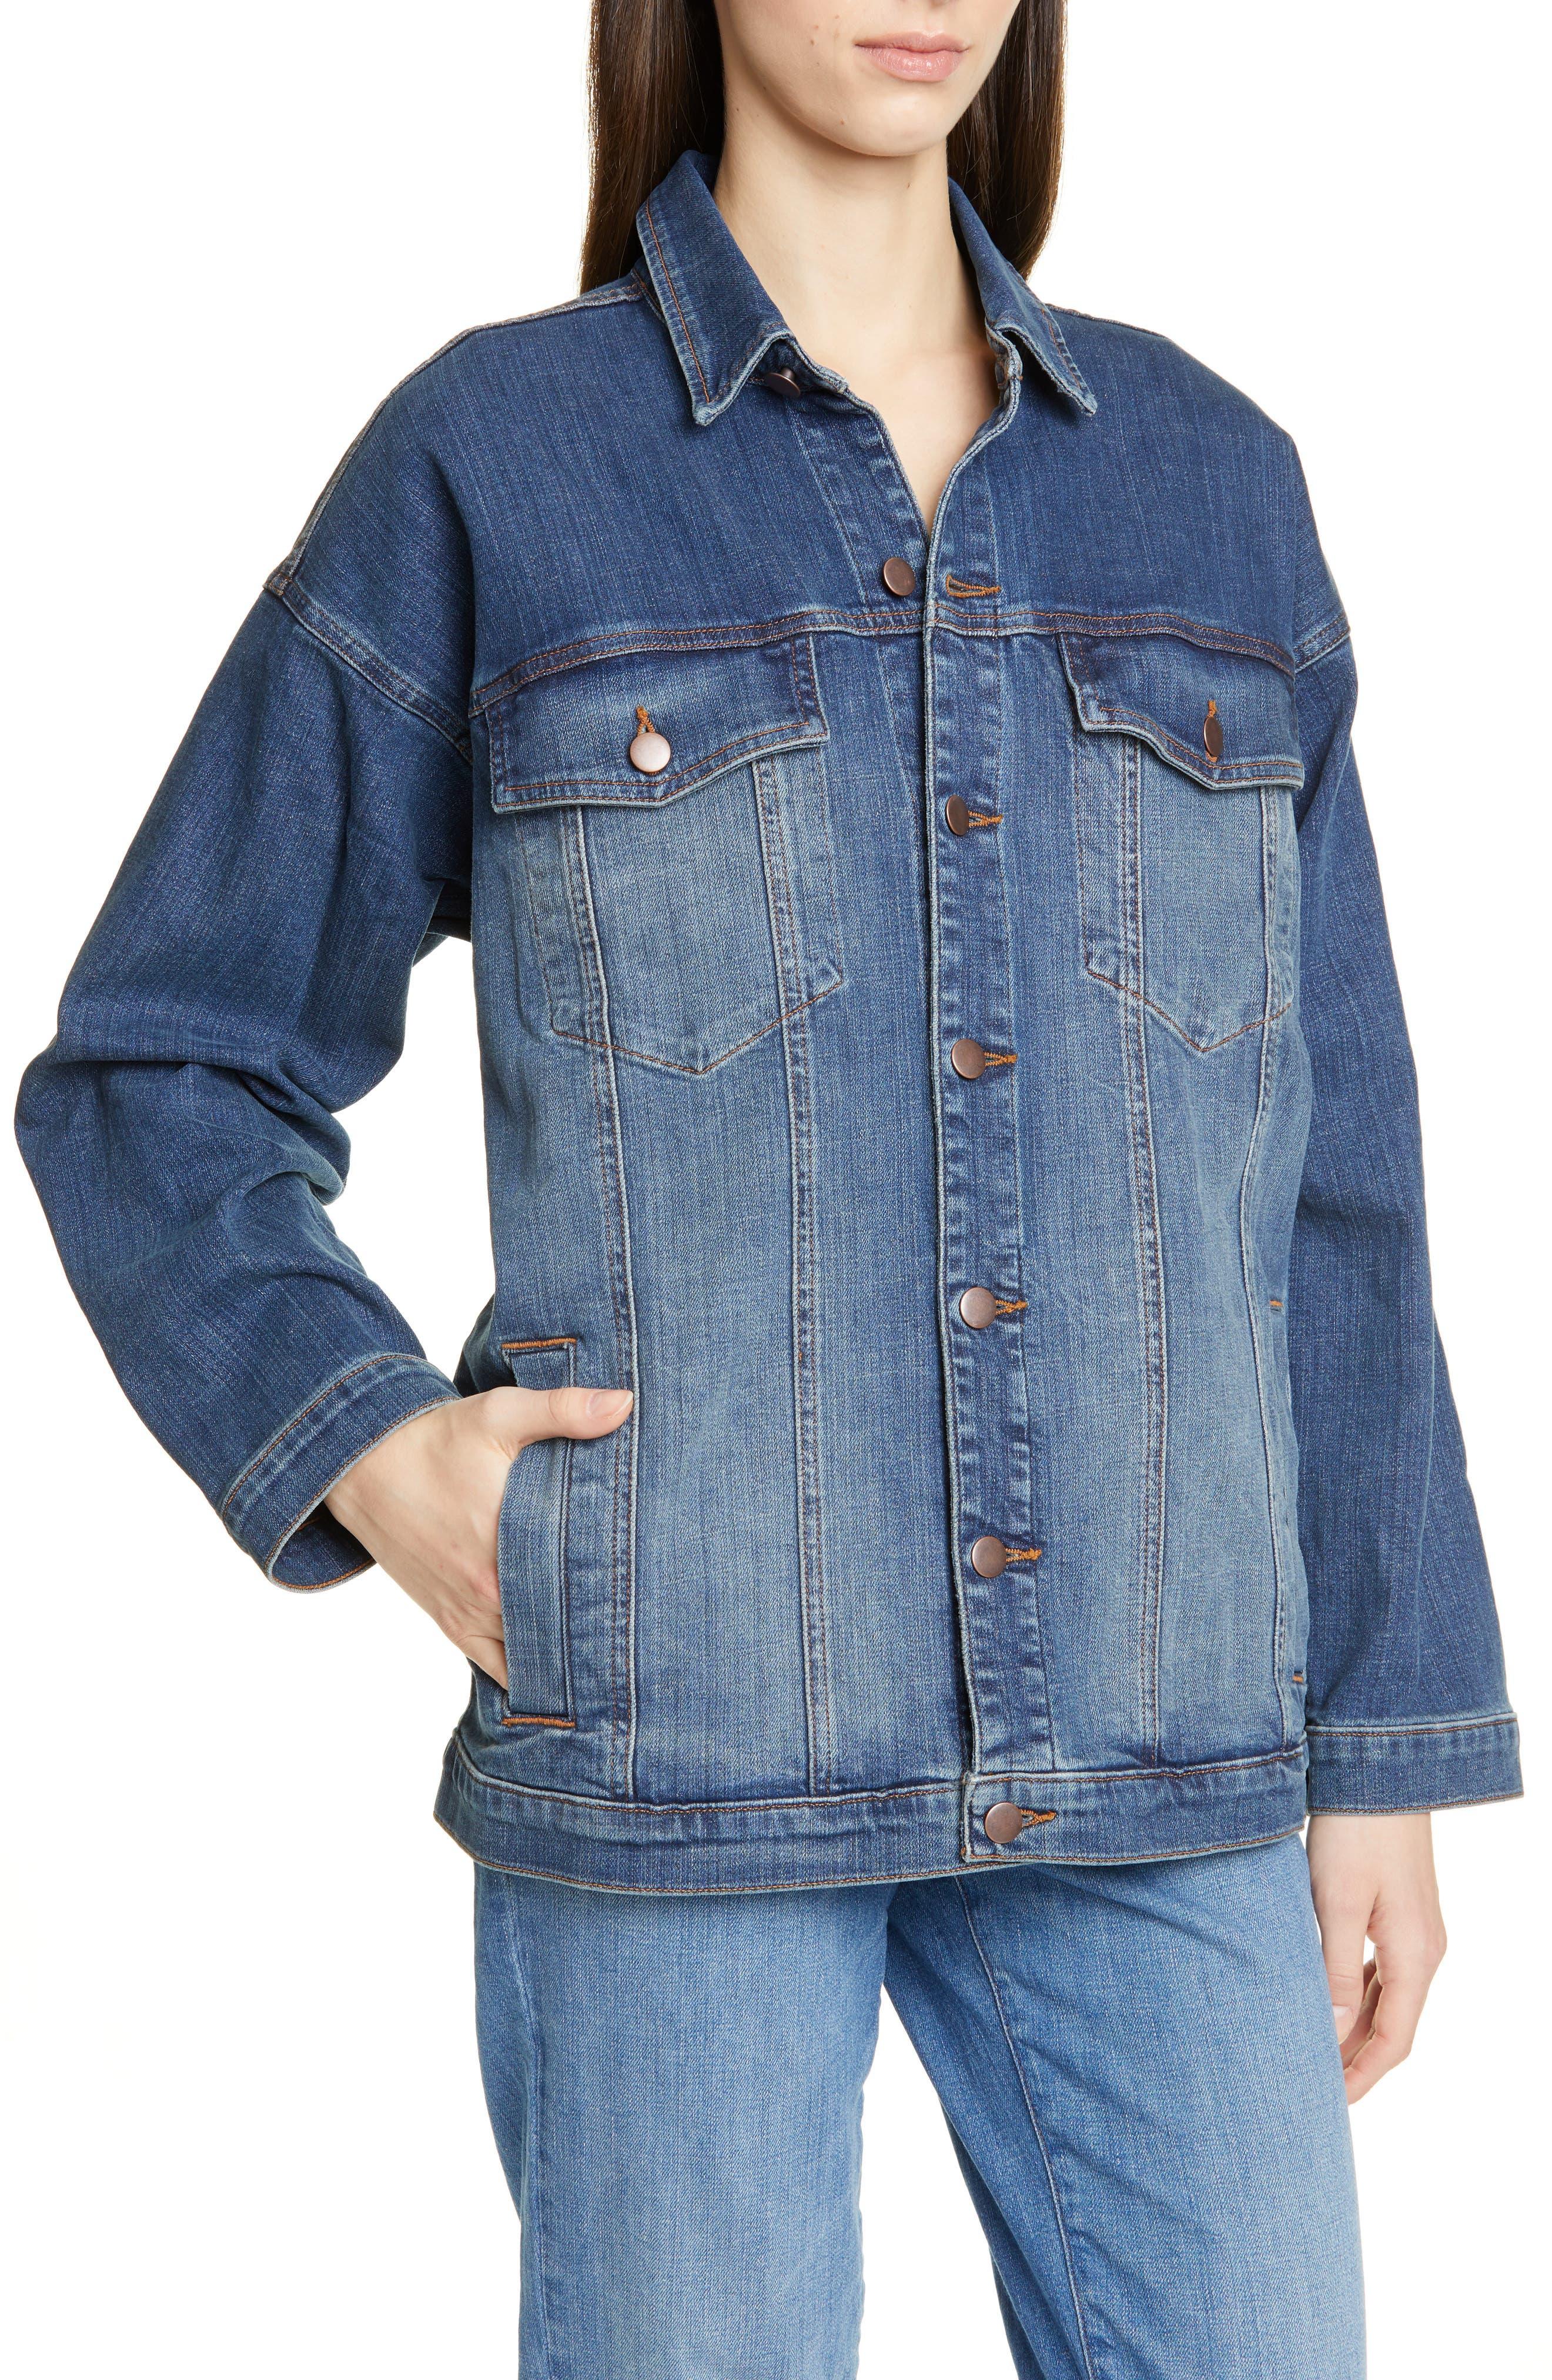 EILEEN FISHER, Oversize Stretch Organic Cotton Denim Jacket, Alternate thumbnail 5, color, AGED INDIGO